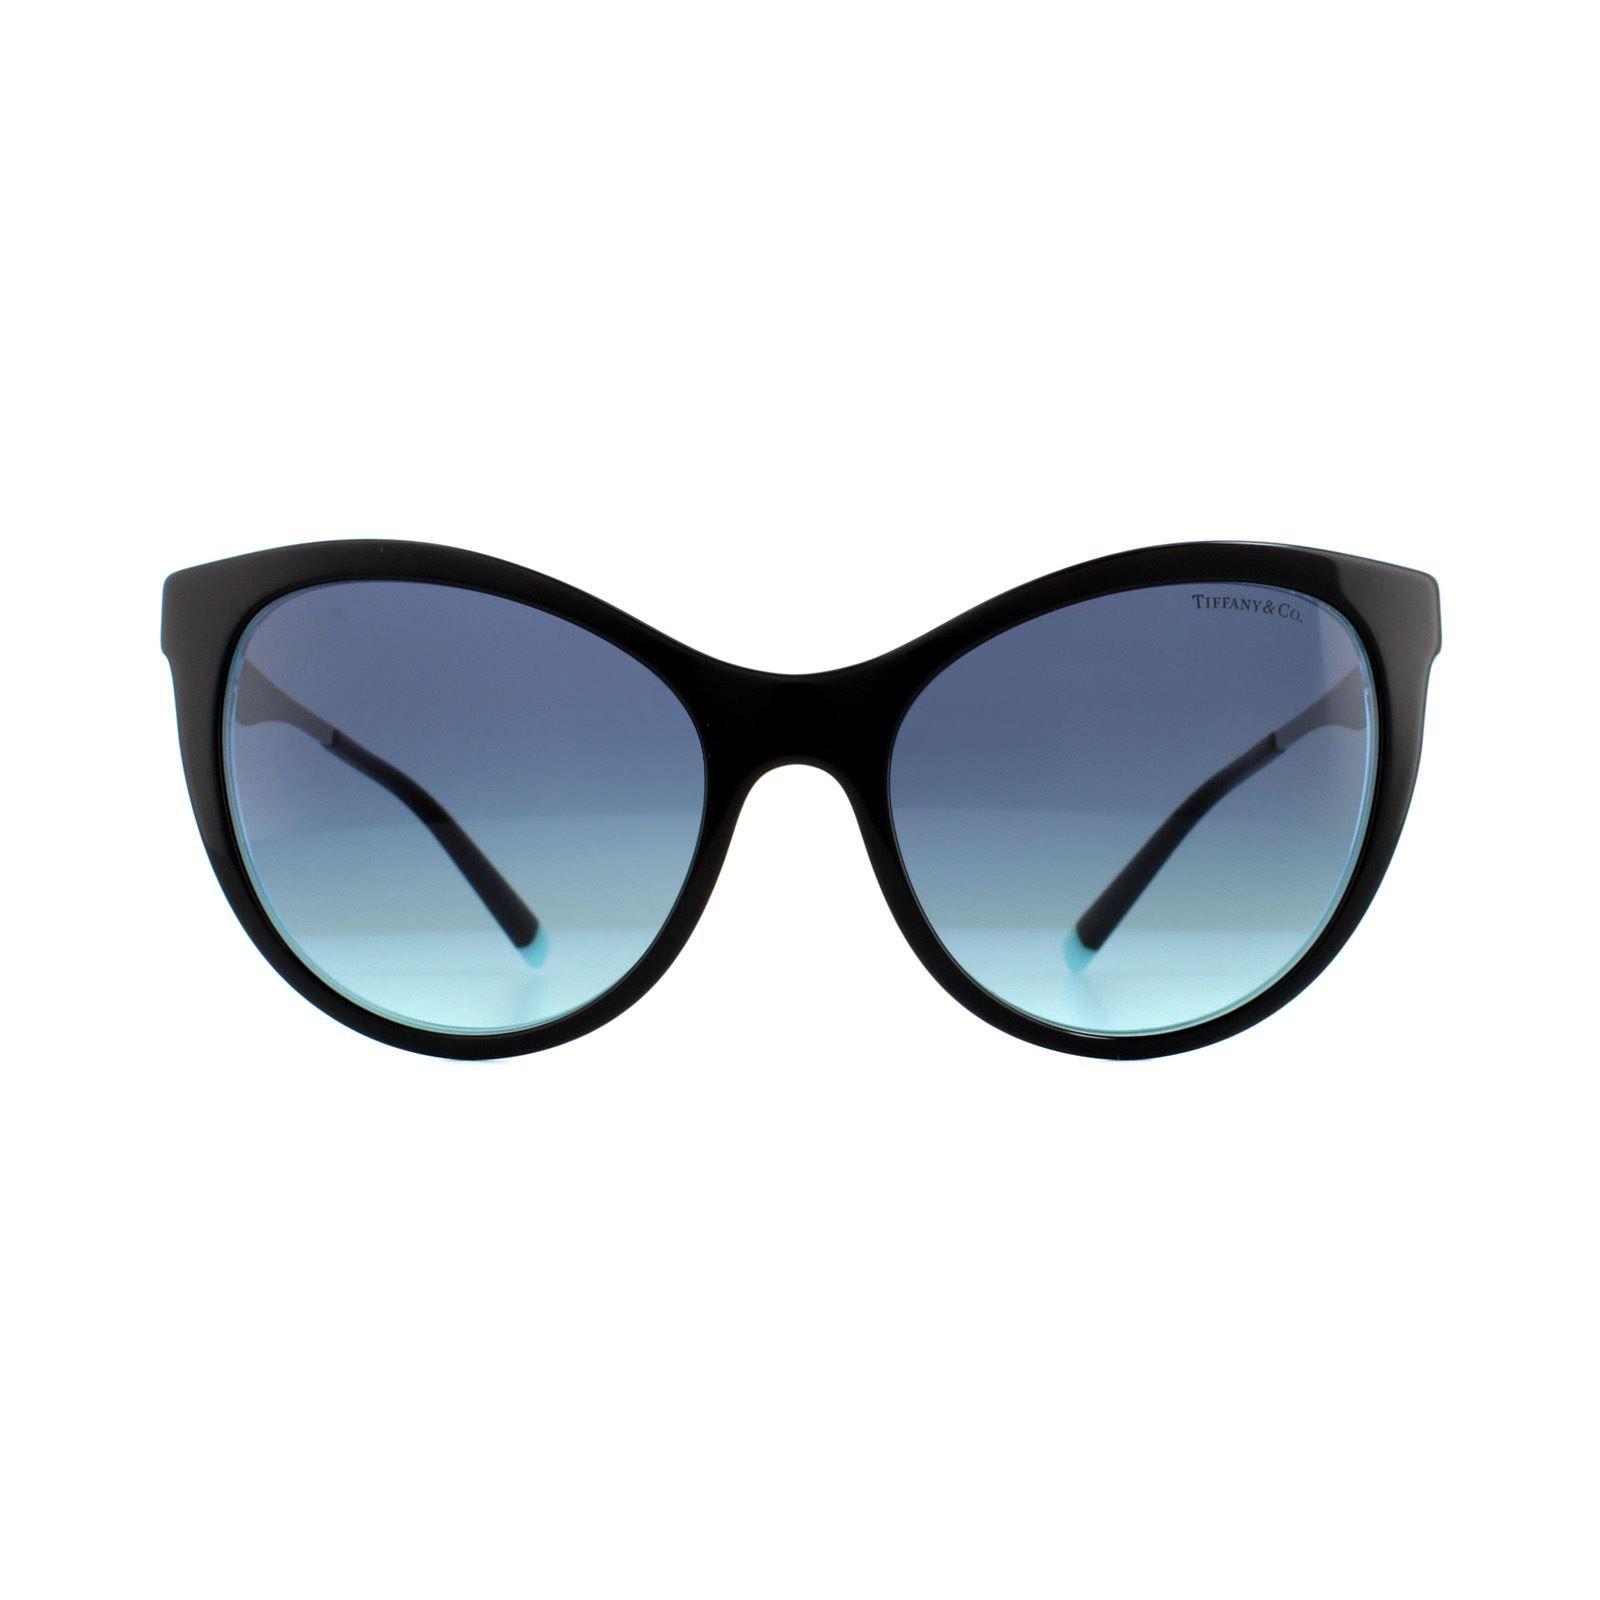 Tiffany Sunglasses TF 4159 82749S Black & Crystal Blue Azure Blue Gradient